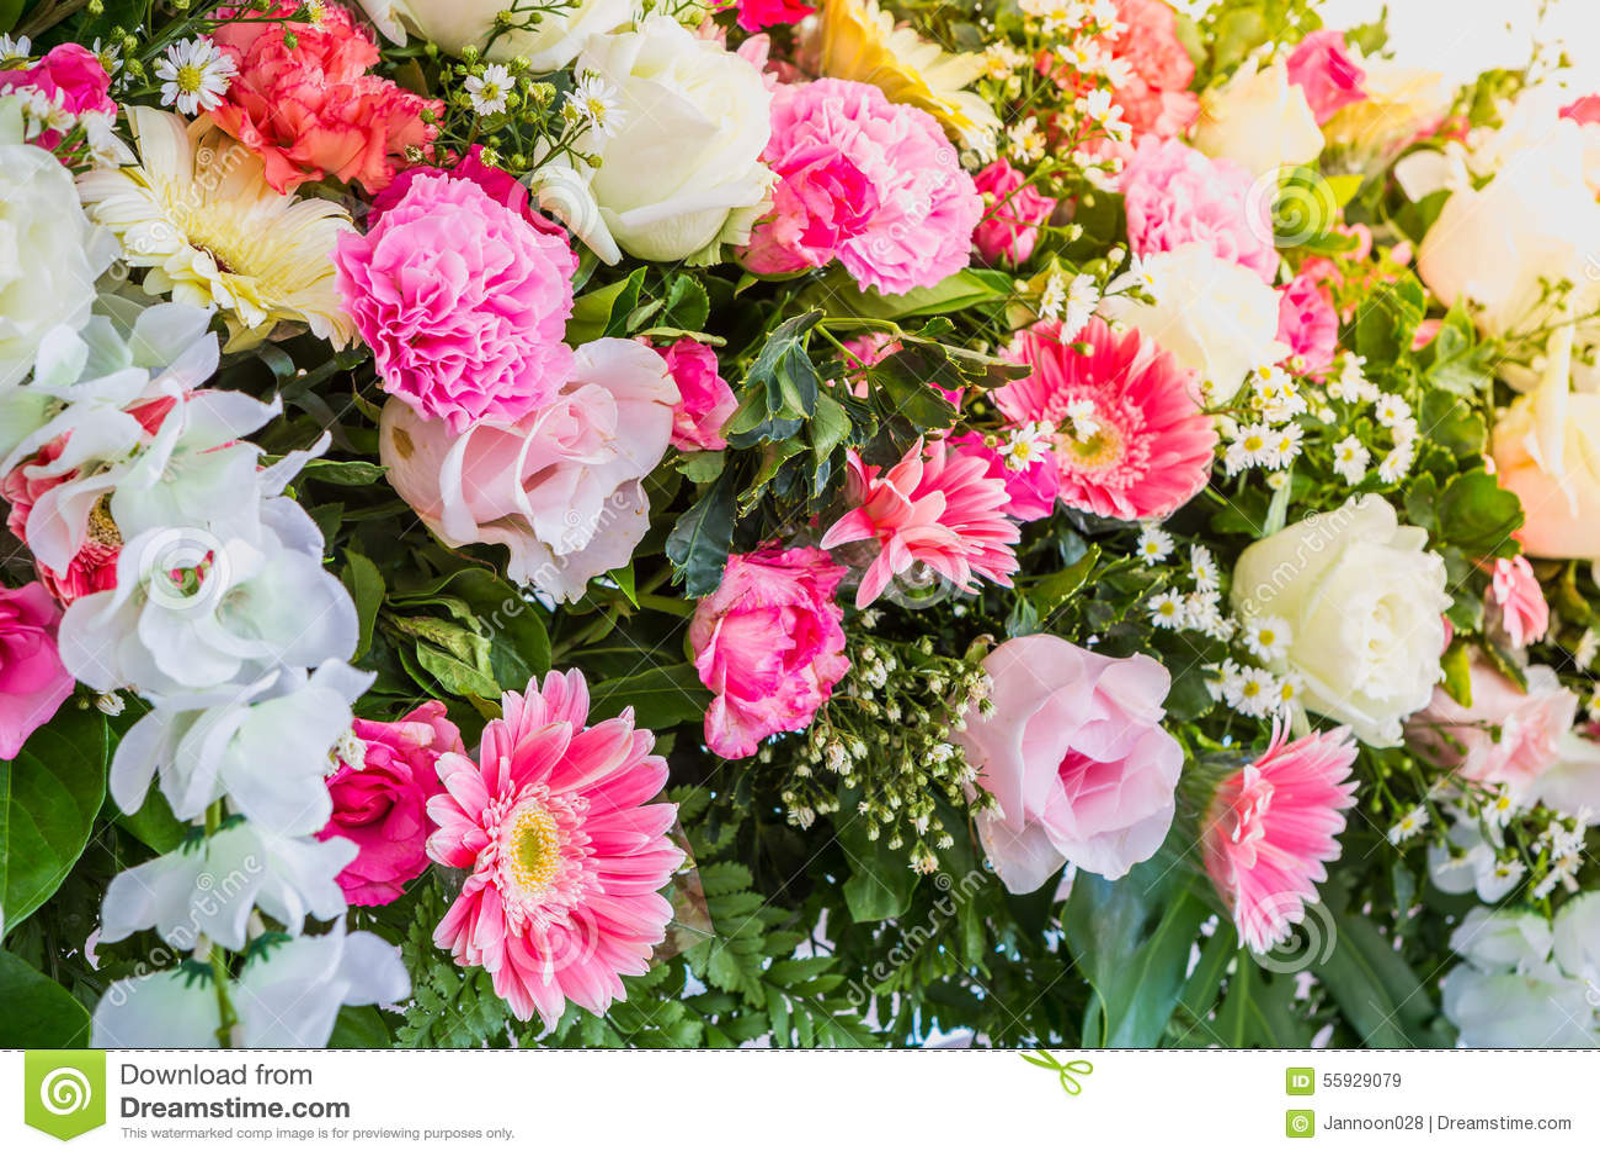 Gorgeous Wedding Ceremonies: Beautiful In Wedding Ceremony Stock Photo